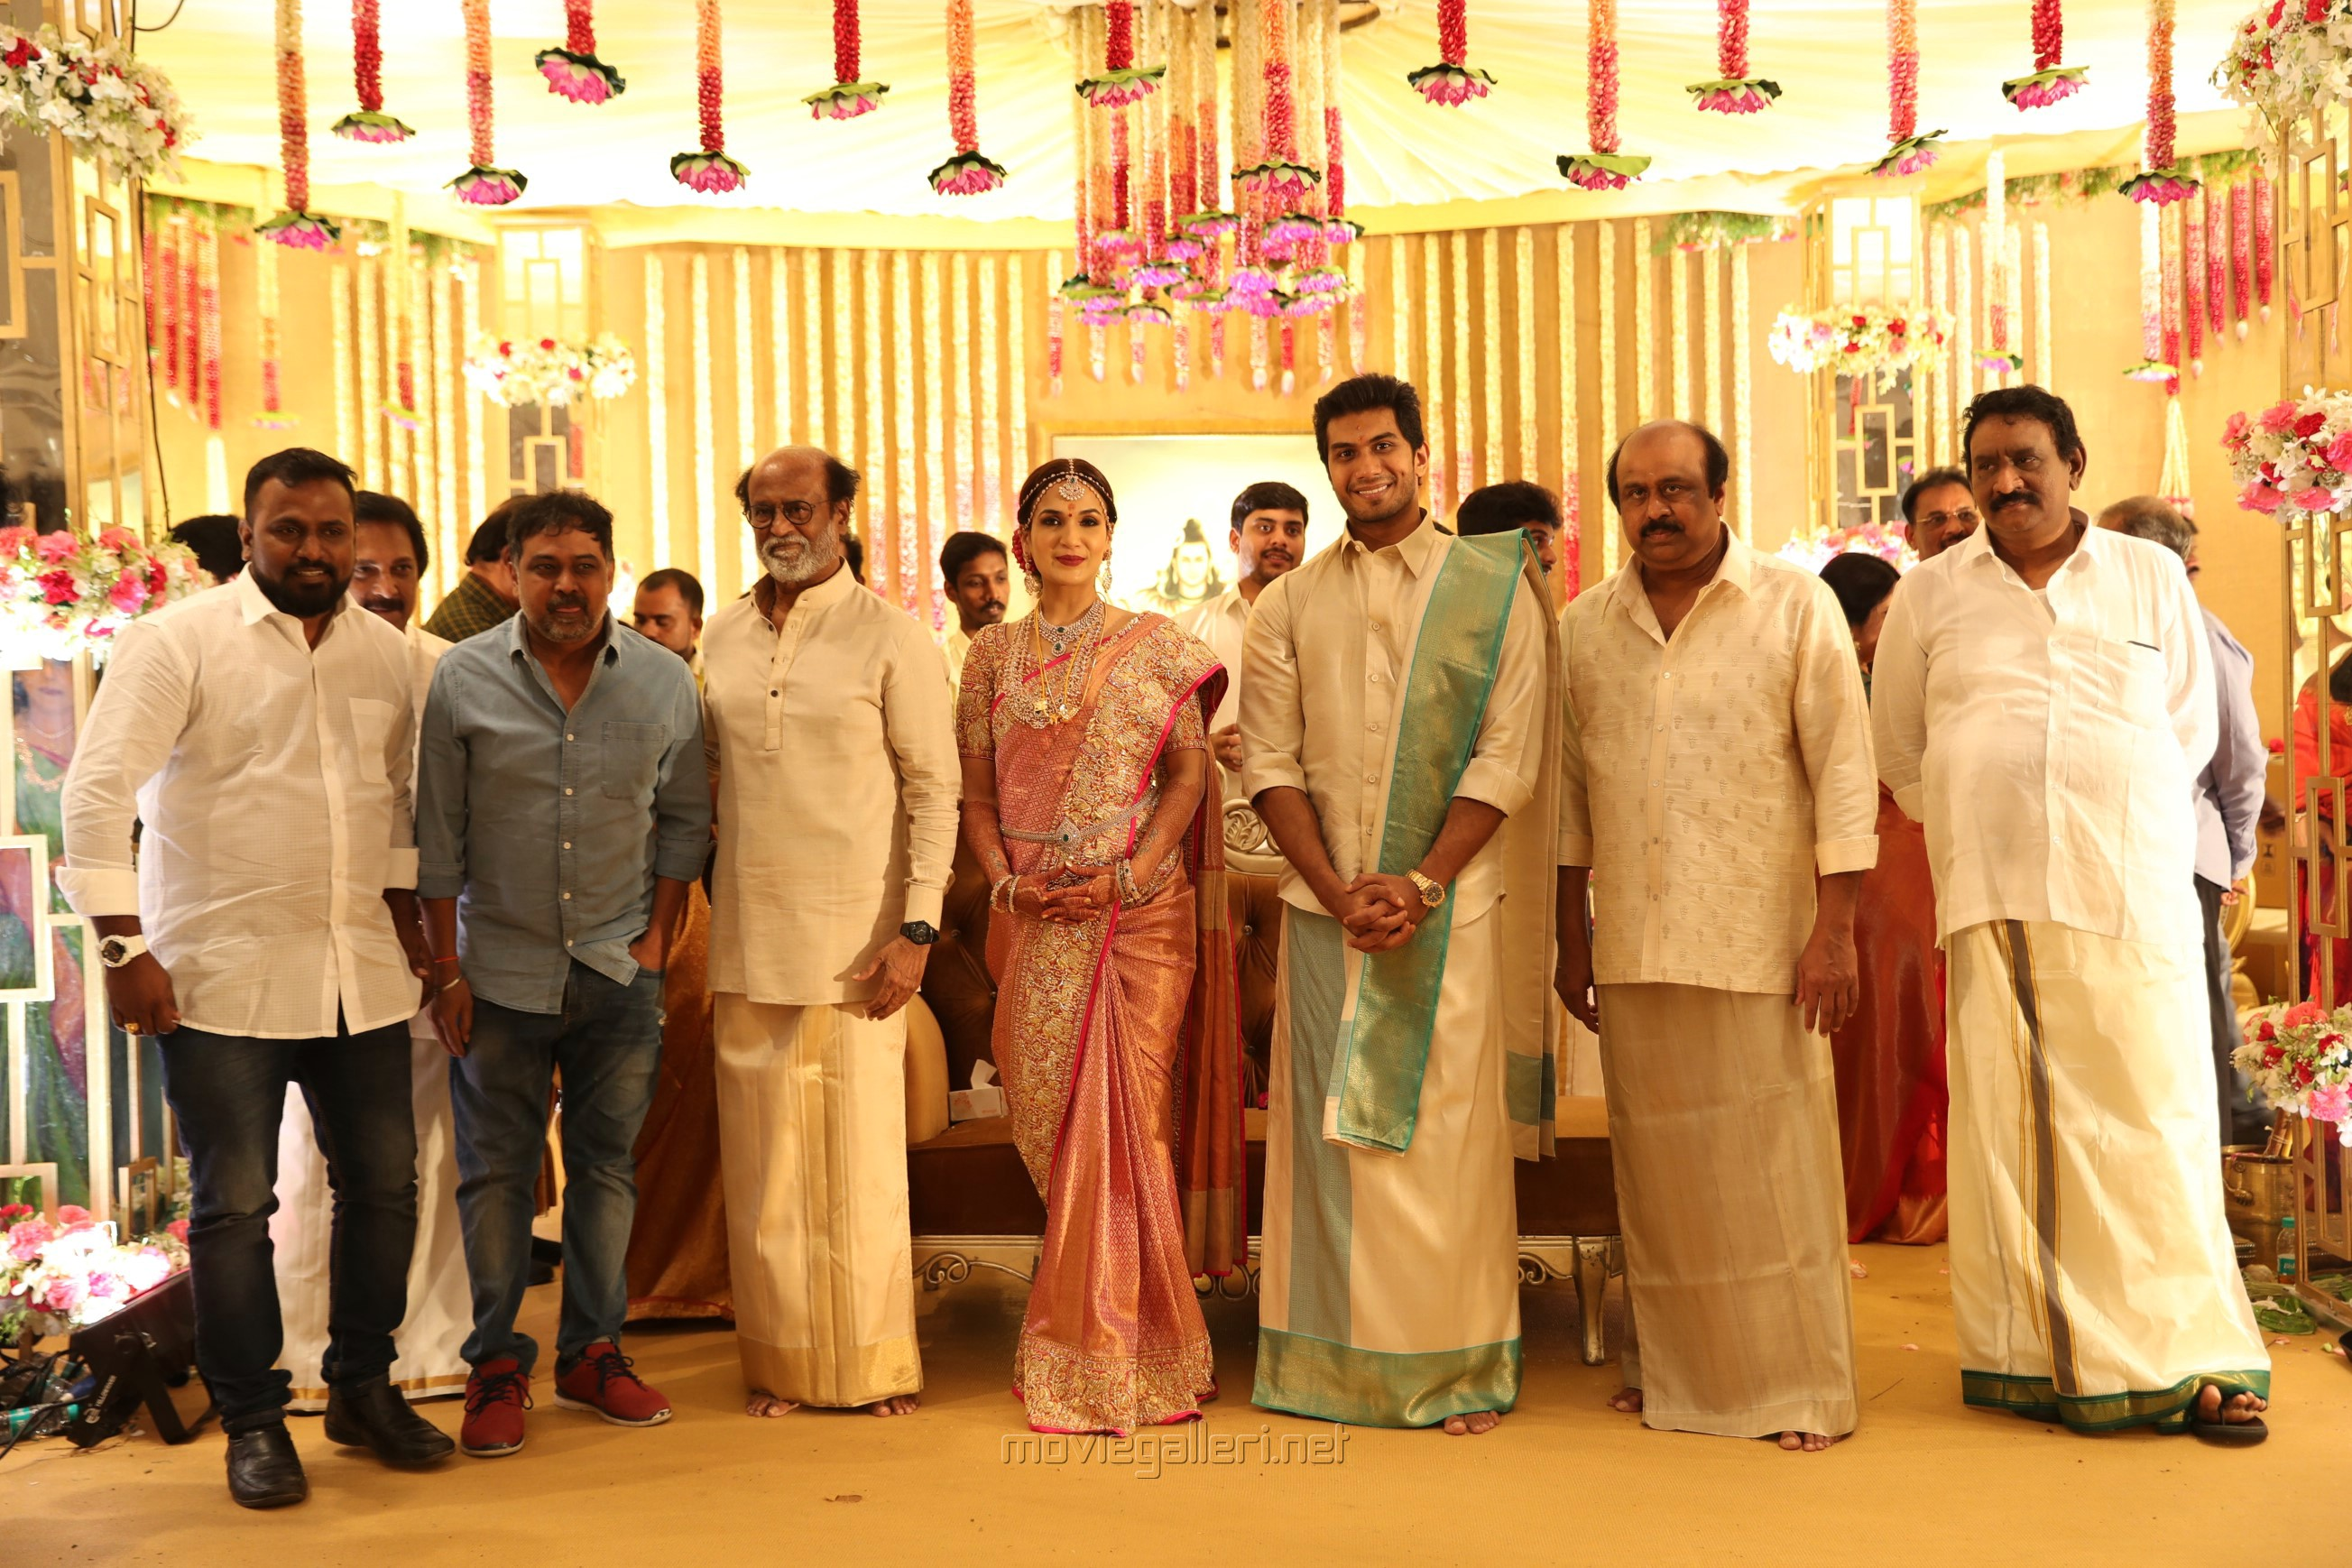 N. Lingusamy @ Vishagan Soundarya Rajinikanth Marriage Photos HD